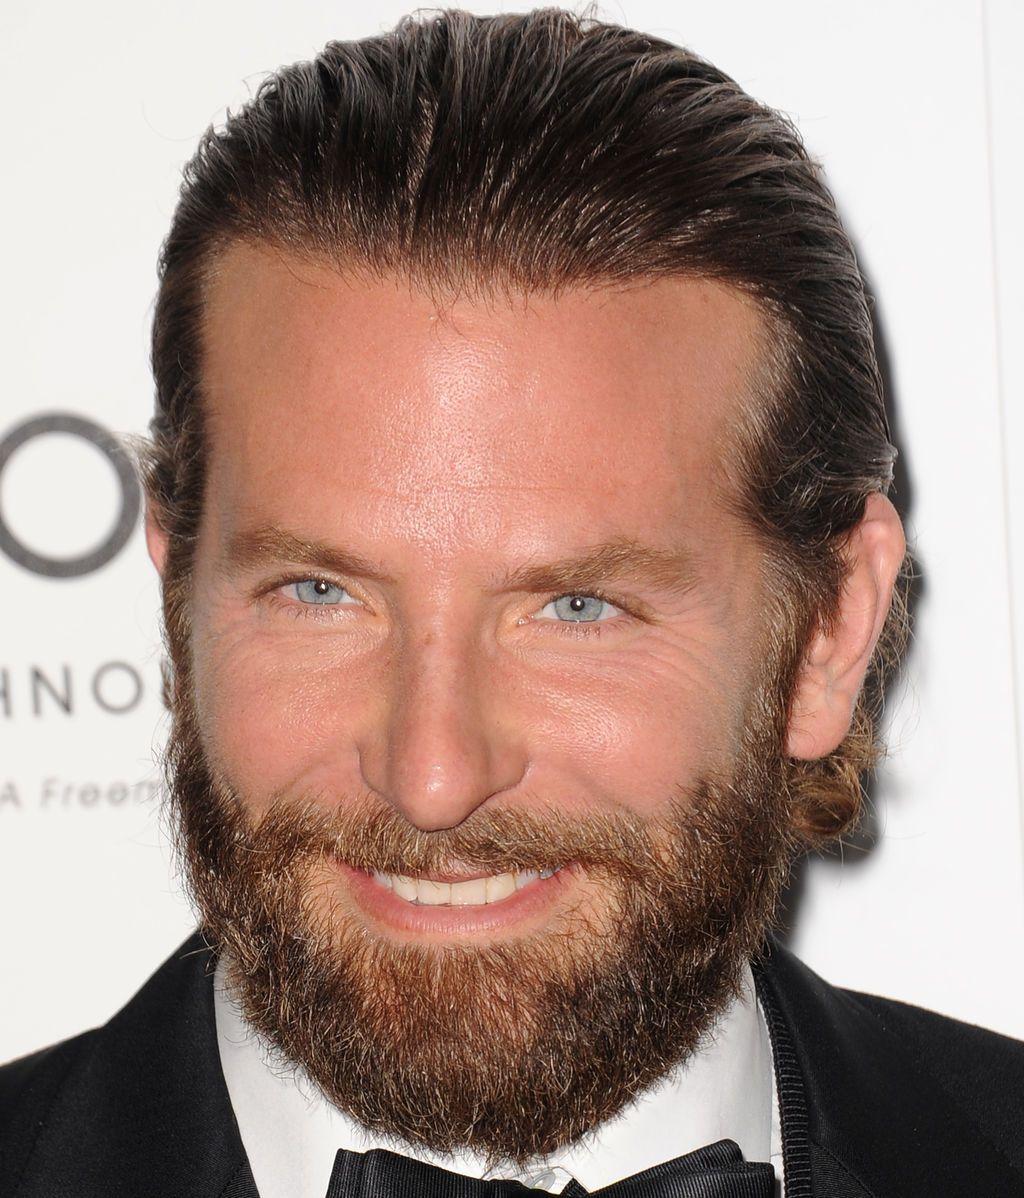 2. Bradley Cooper